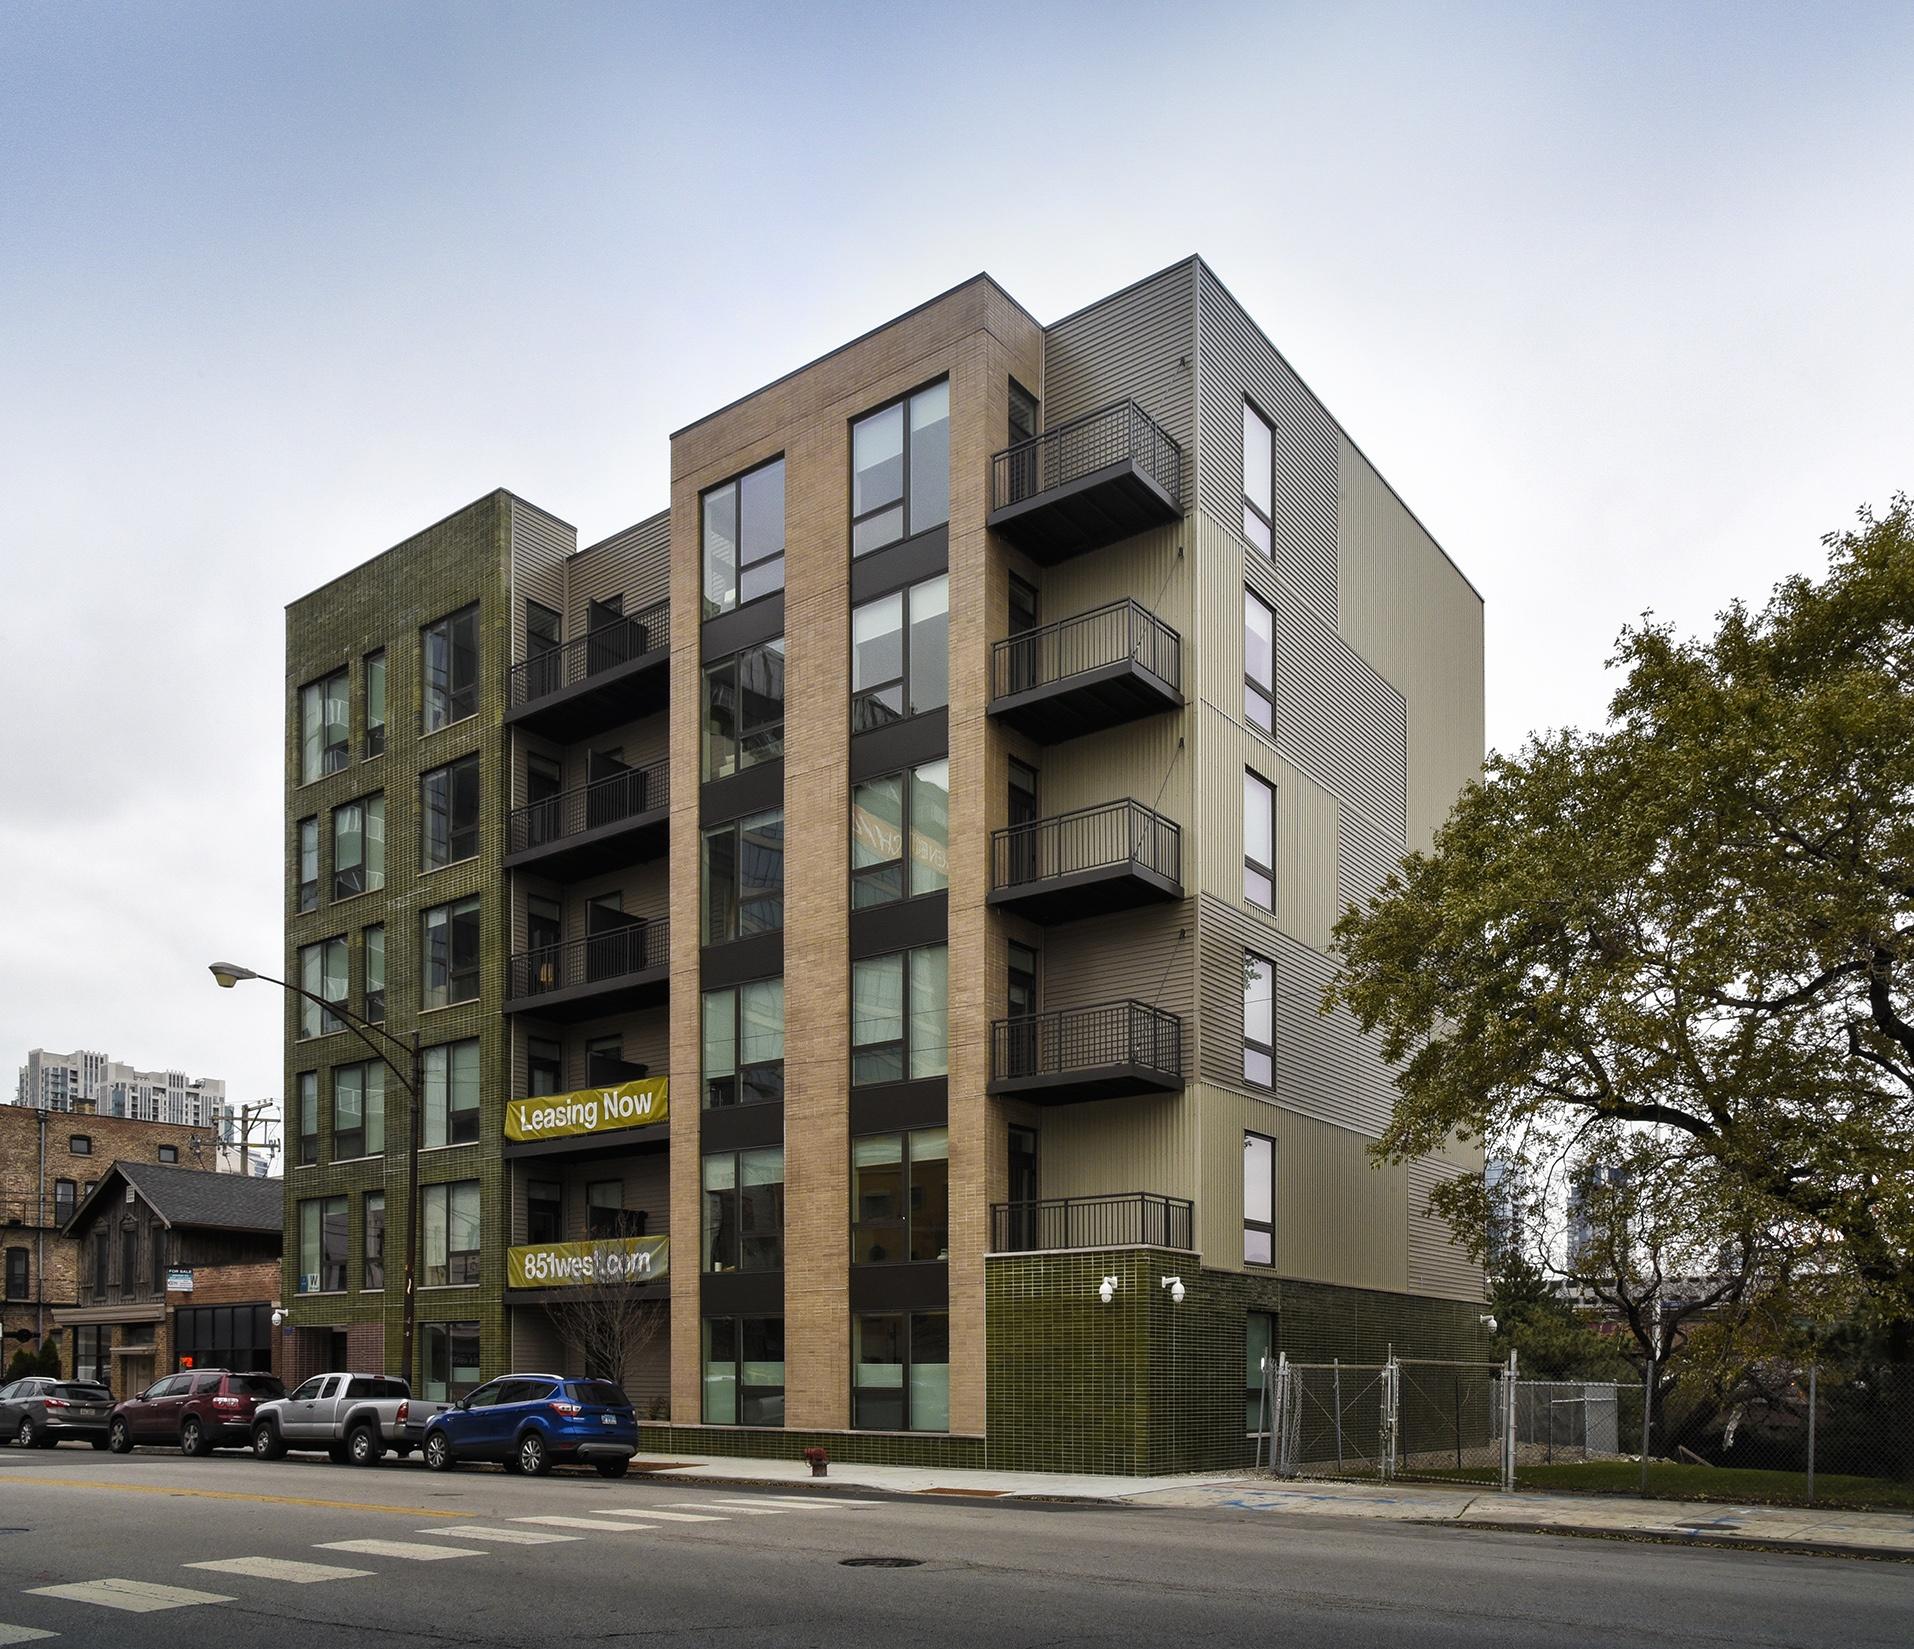 851 West Grand Avenue